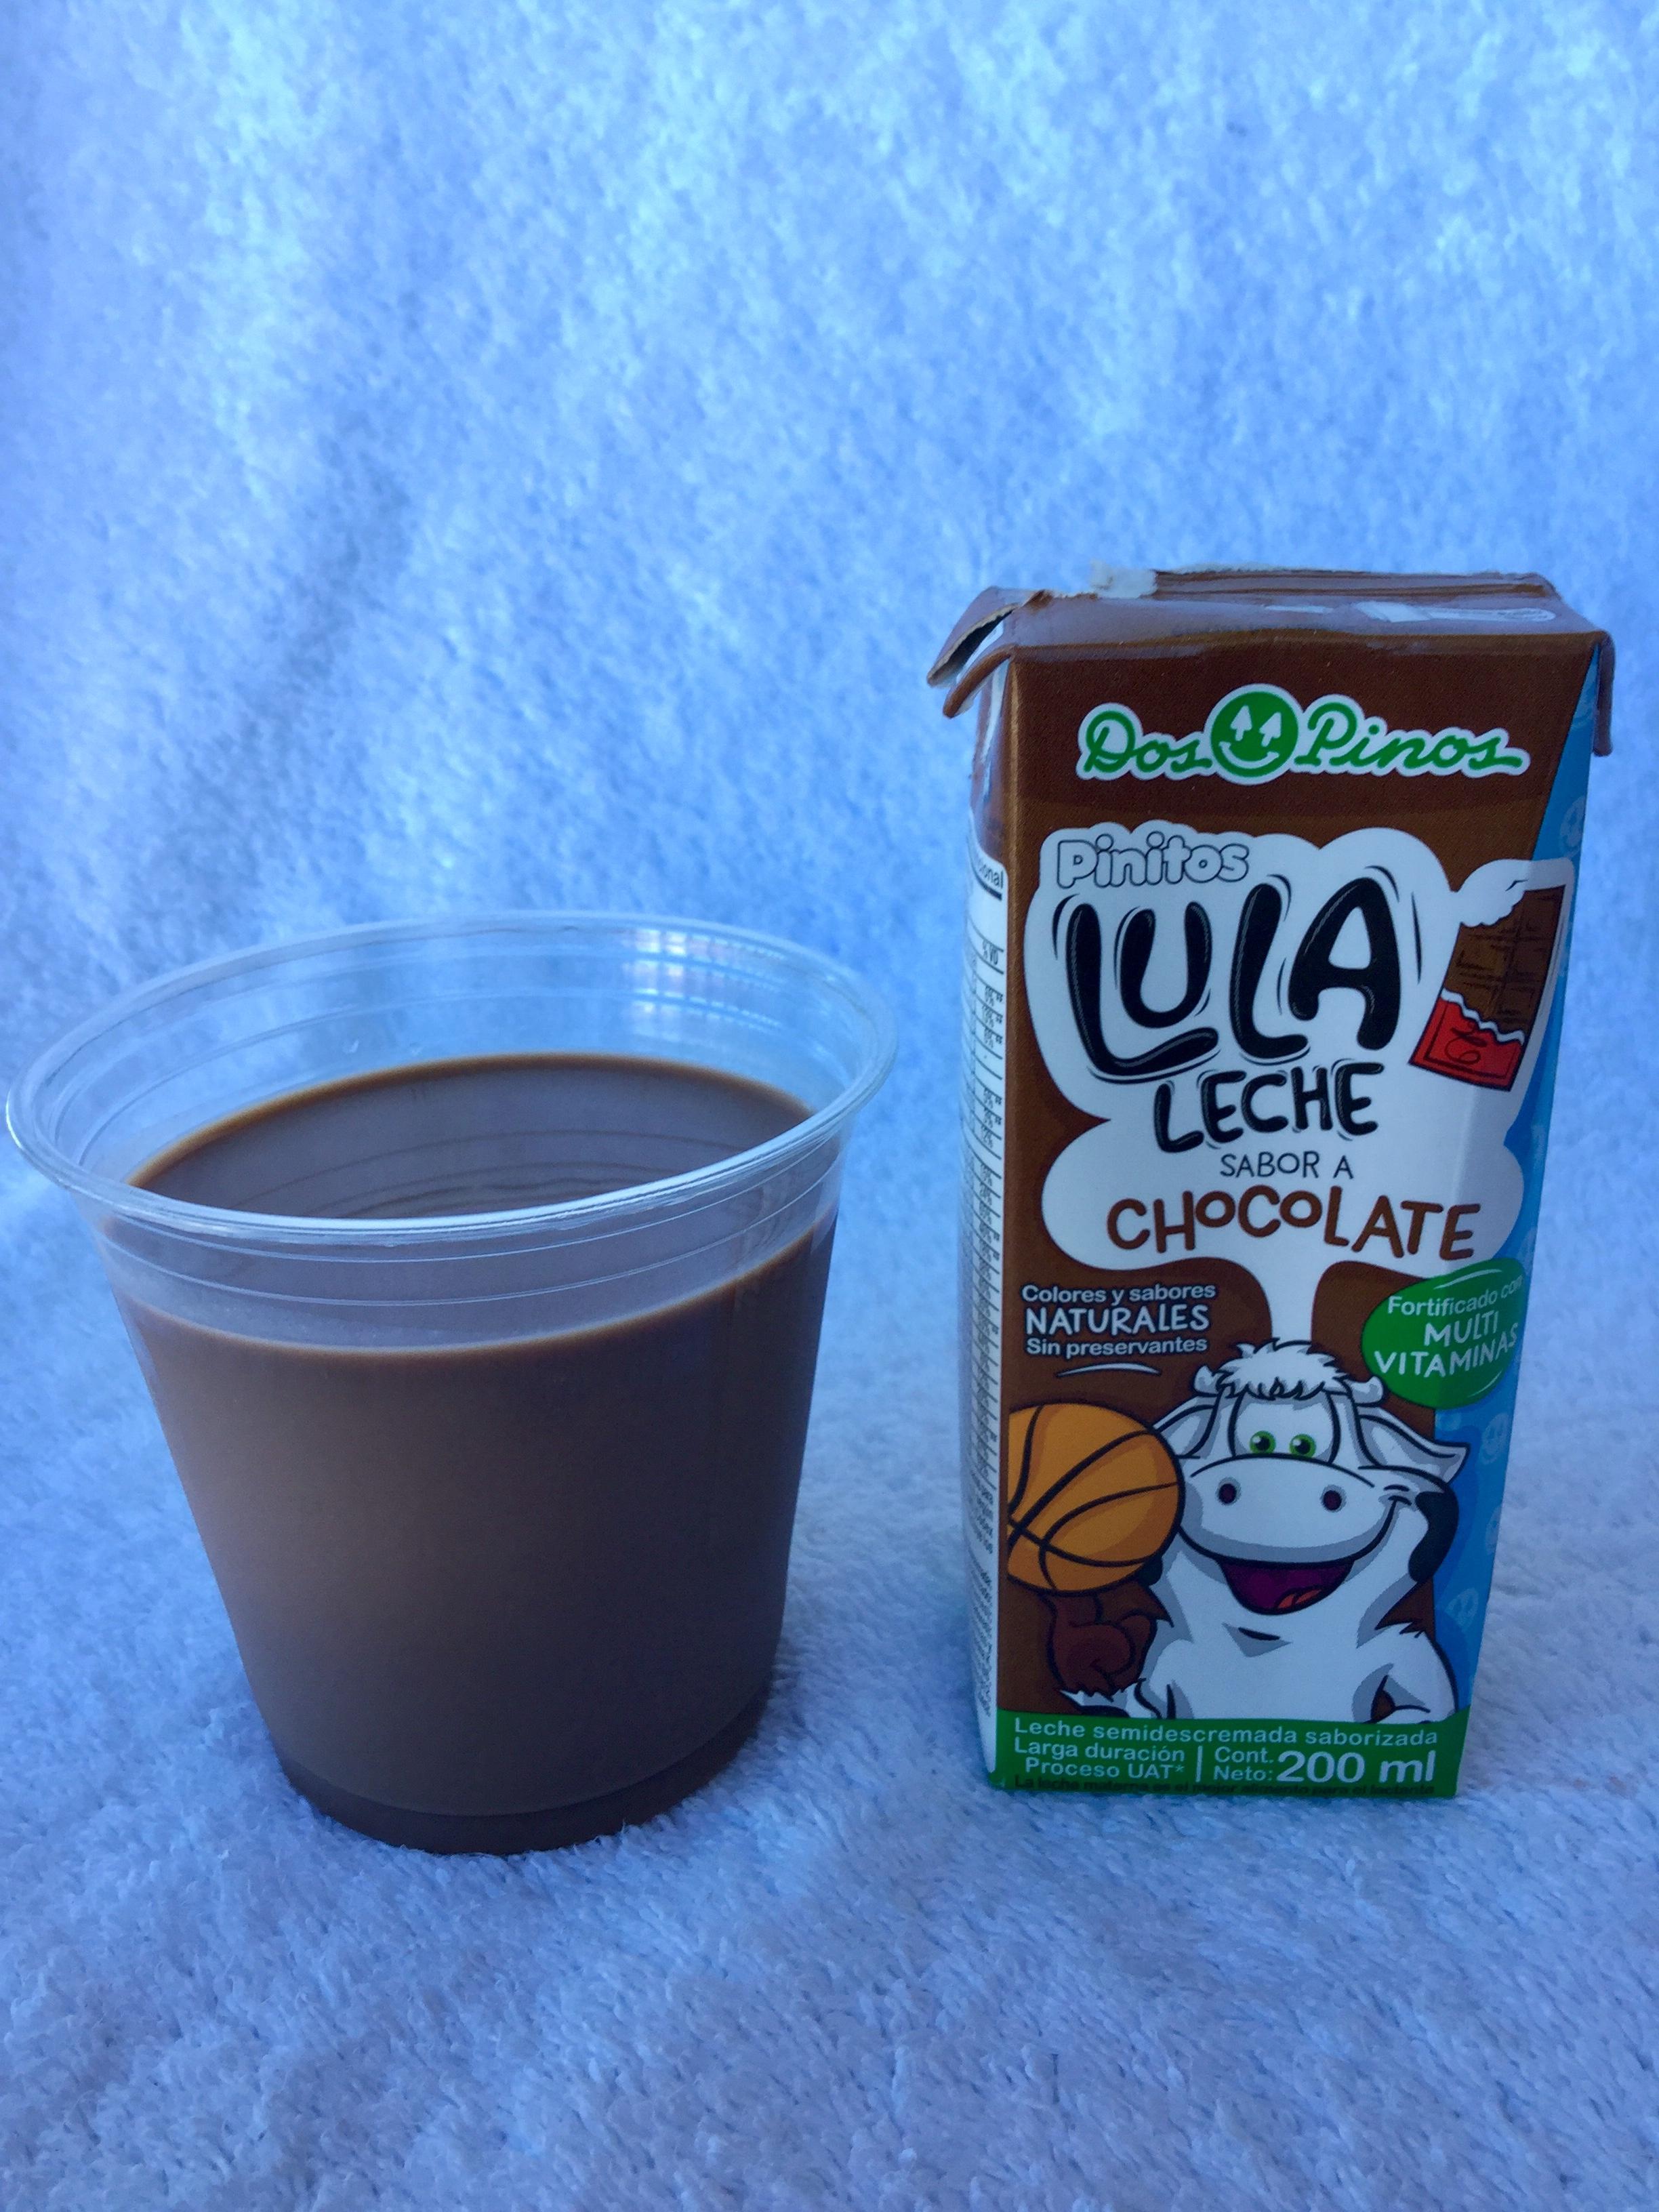 Dos Pinos Pinitos Lula Leche Chocolate Cup